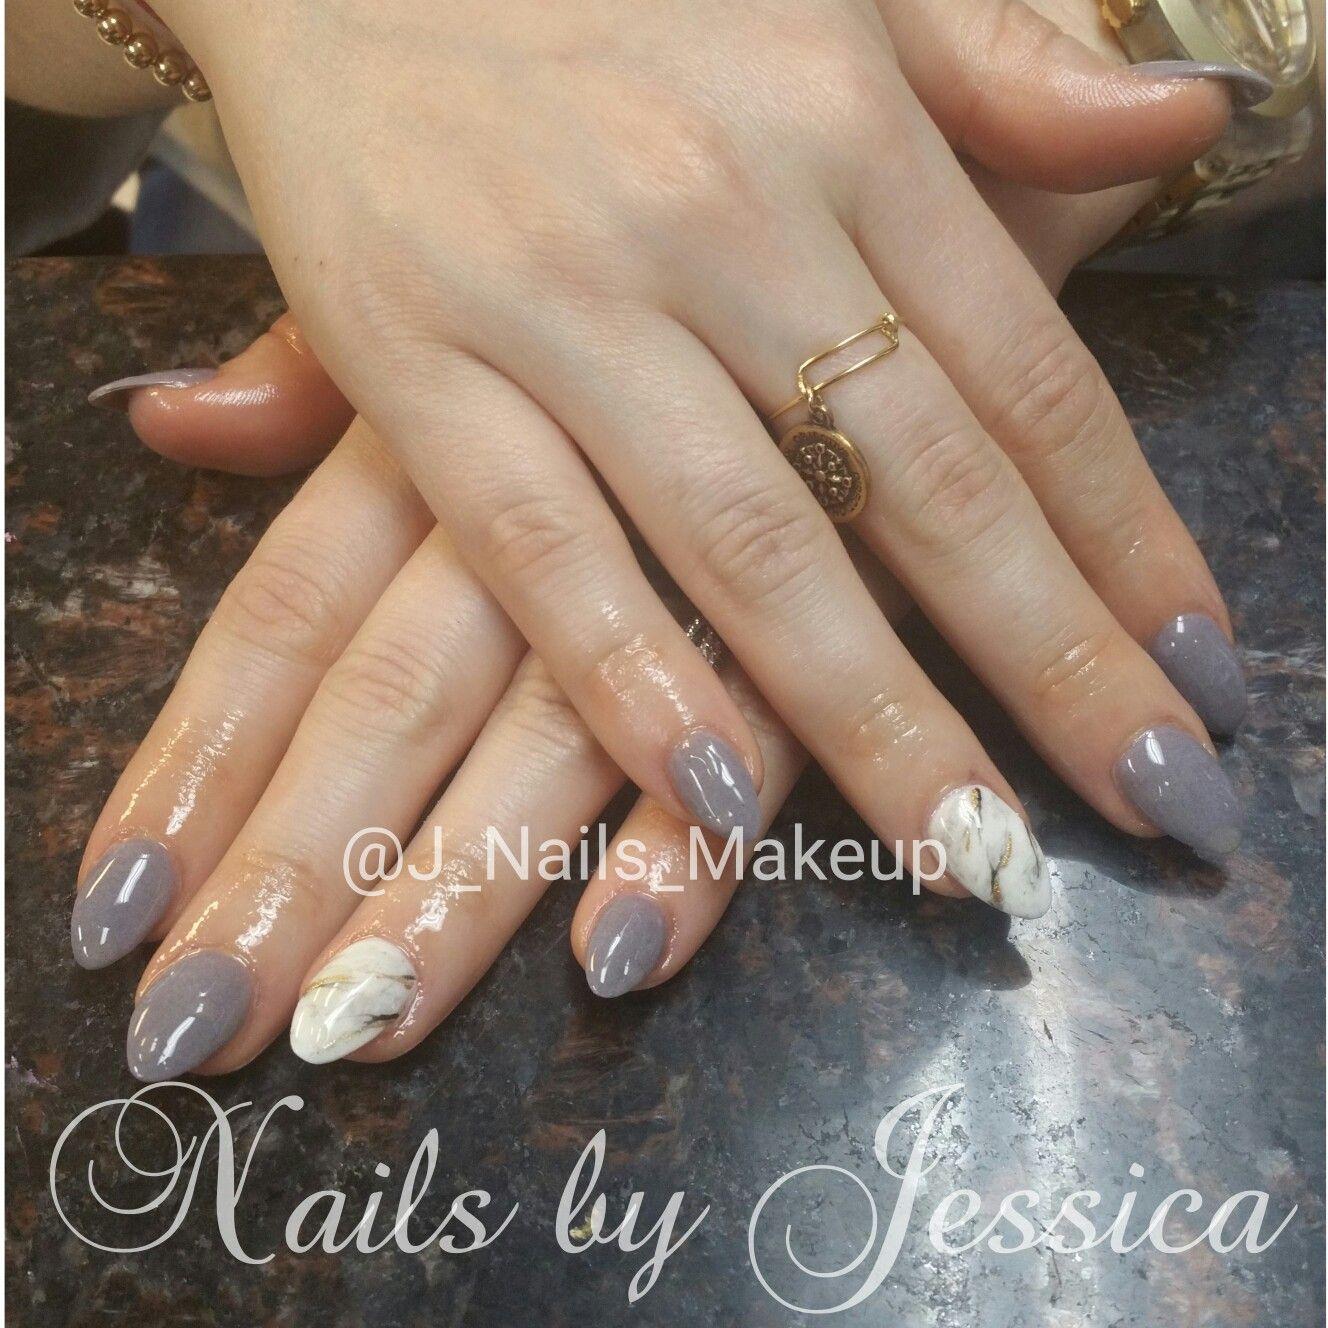 Nexgen Dip Powder Nails With Marble Nail Art Almond Shaped Dip Powder Nails Almond Shape Nails Powder Manicure